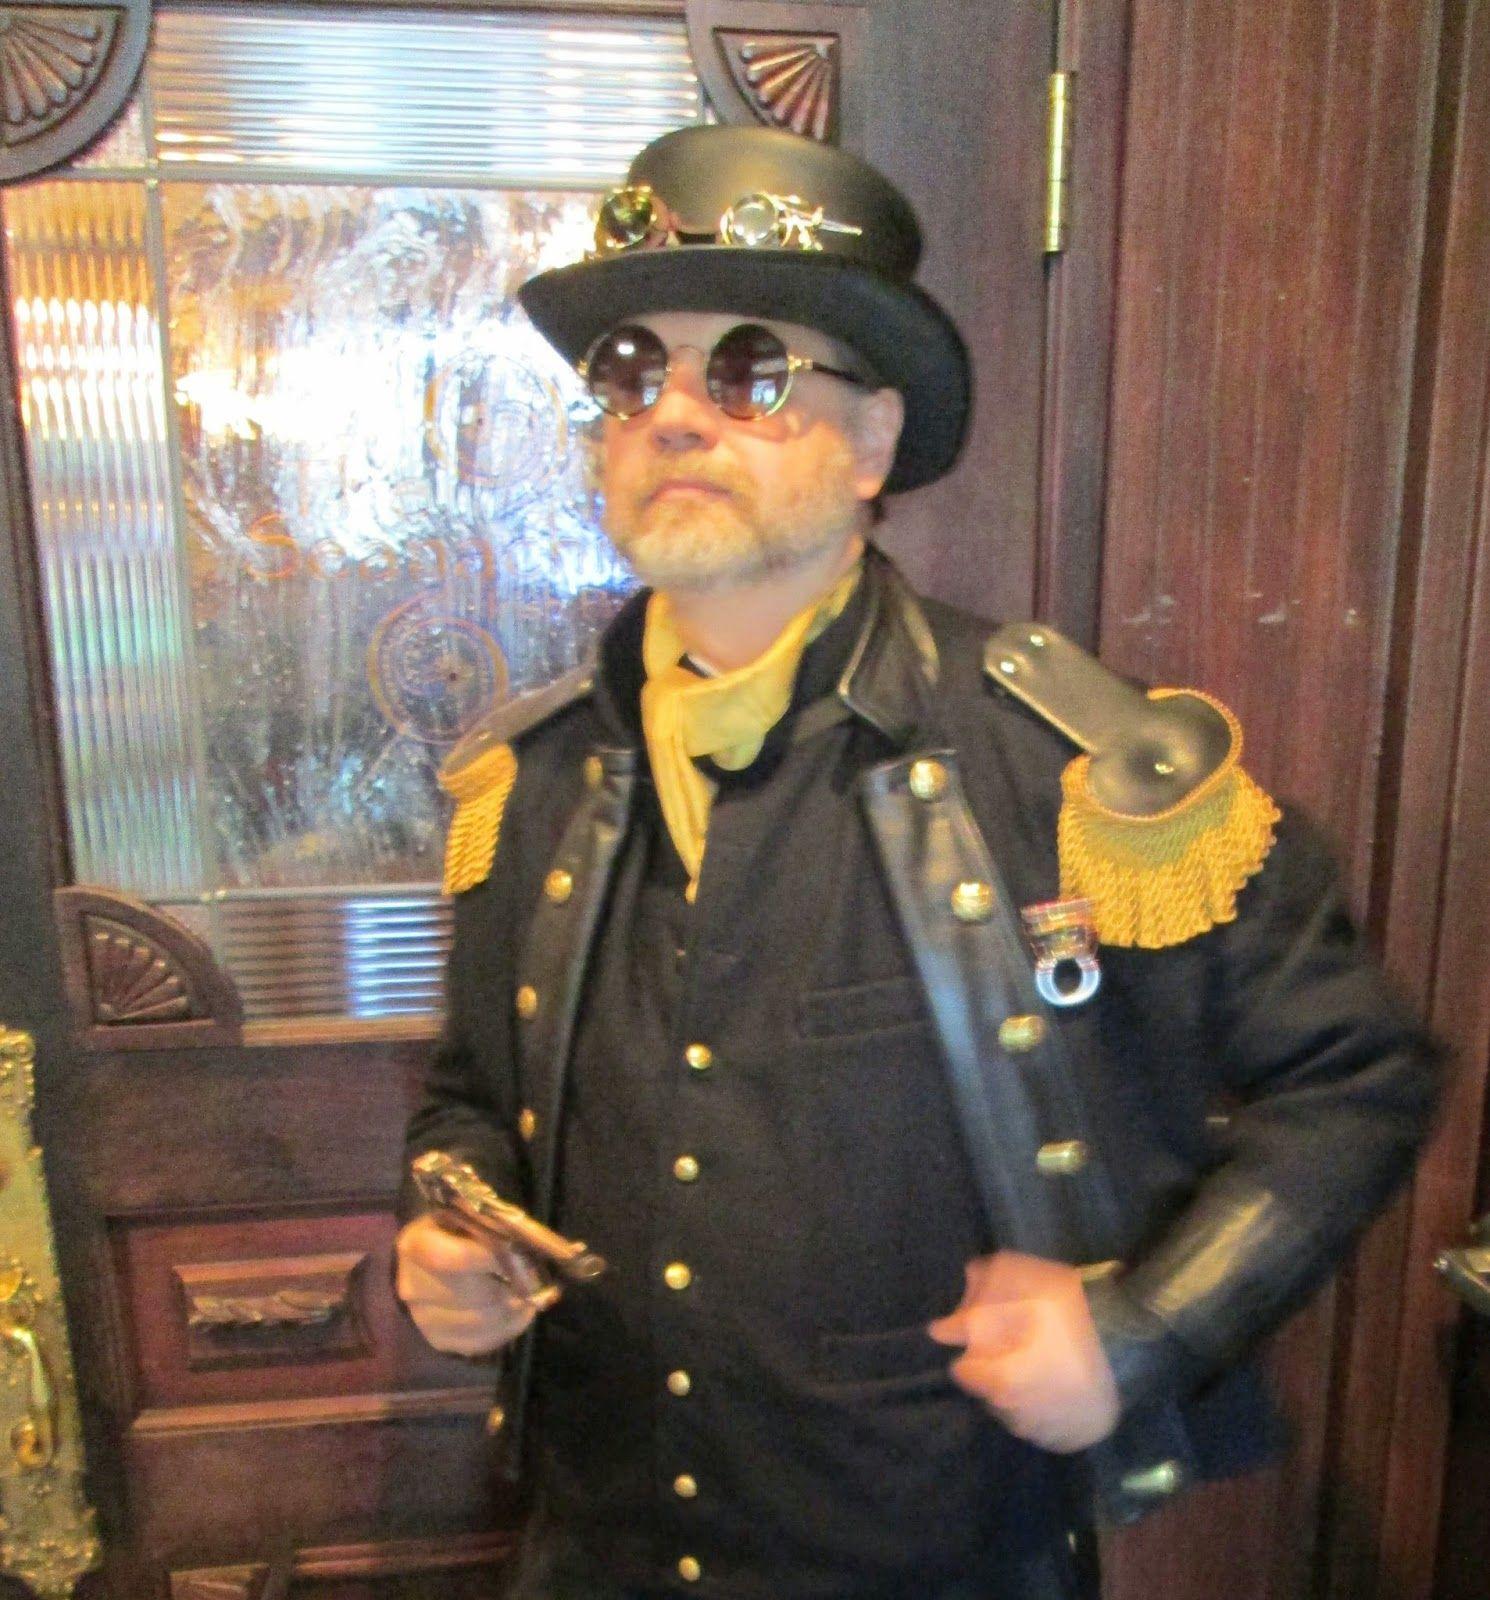 Colonel Mustard Clue Hat